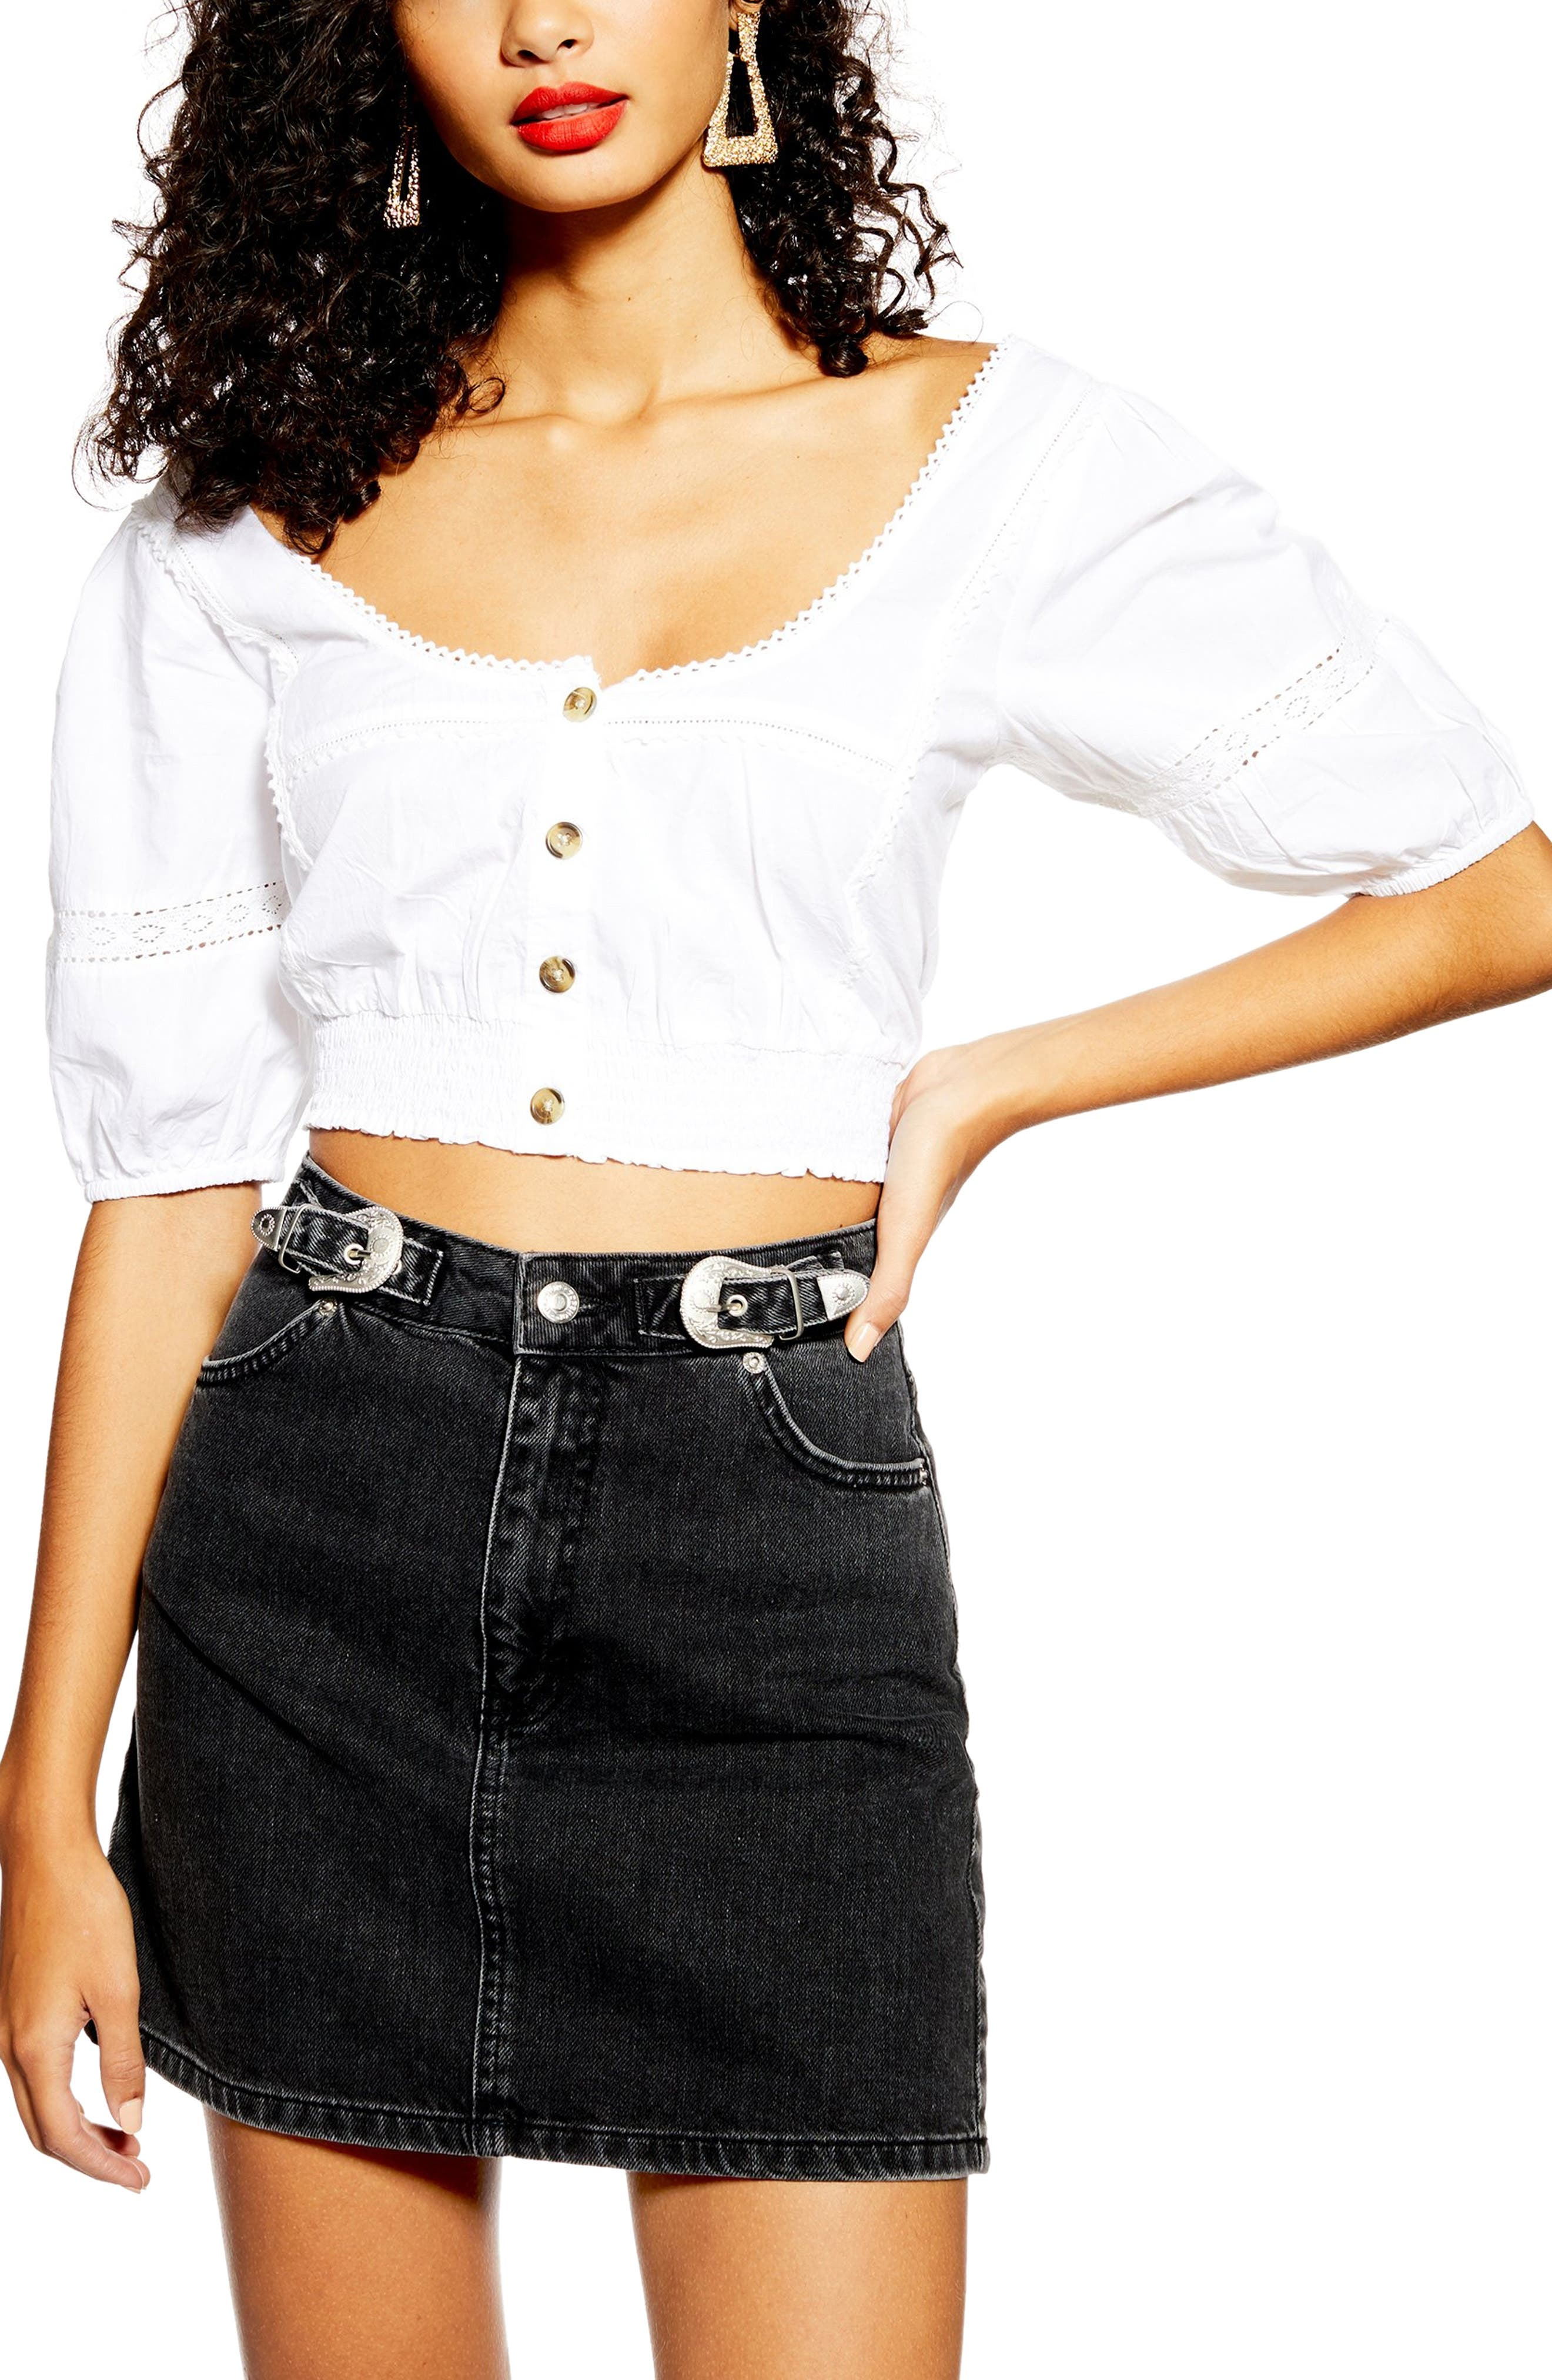 TOPSHOP, Buckle Denim Skirt, Alternate thumbnail 4, color, 002